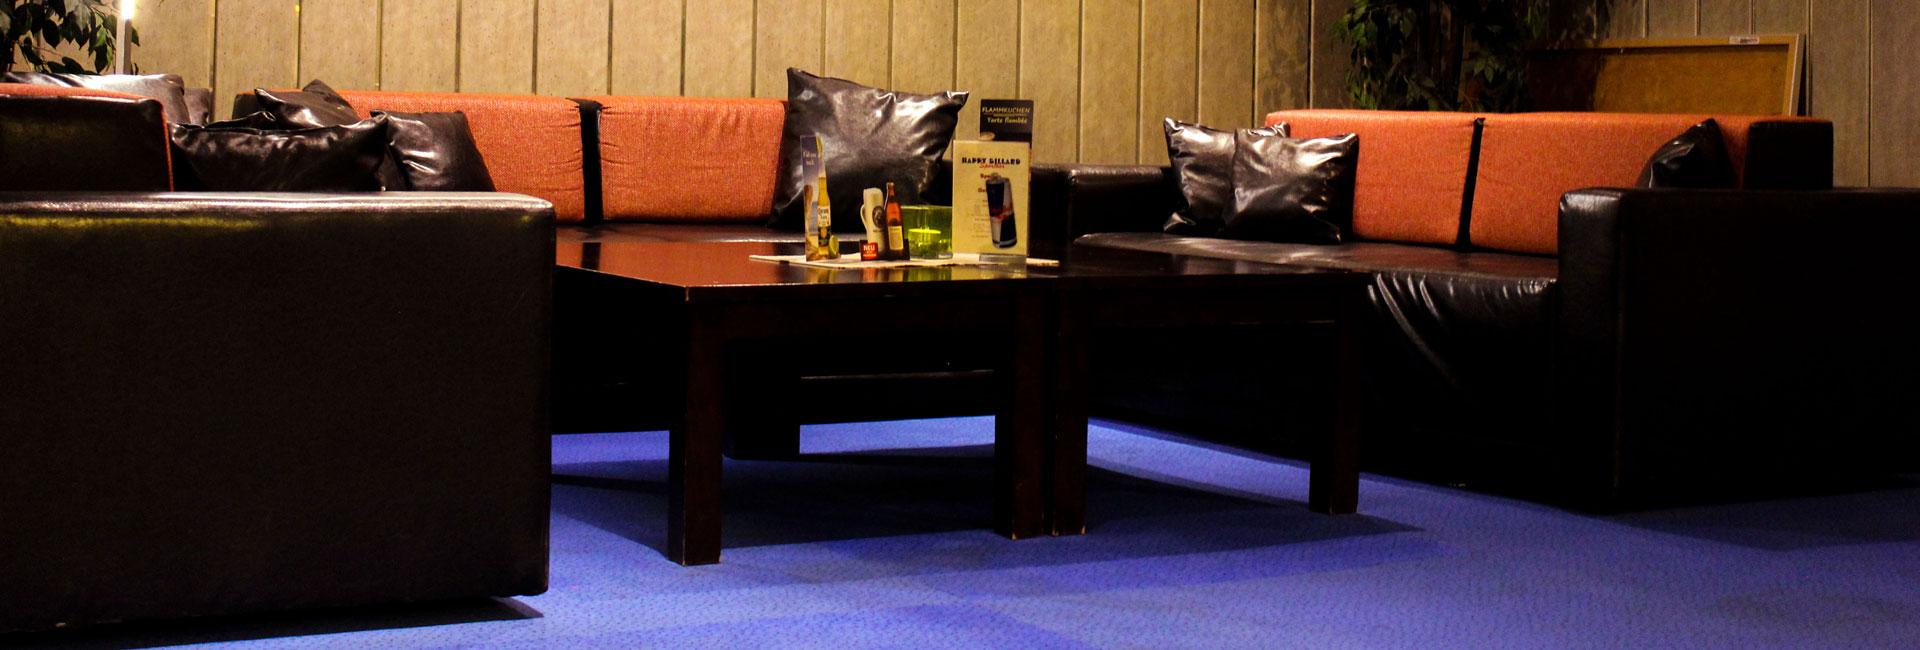 lounge_1920x650